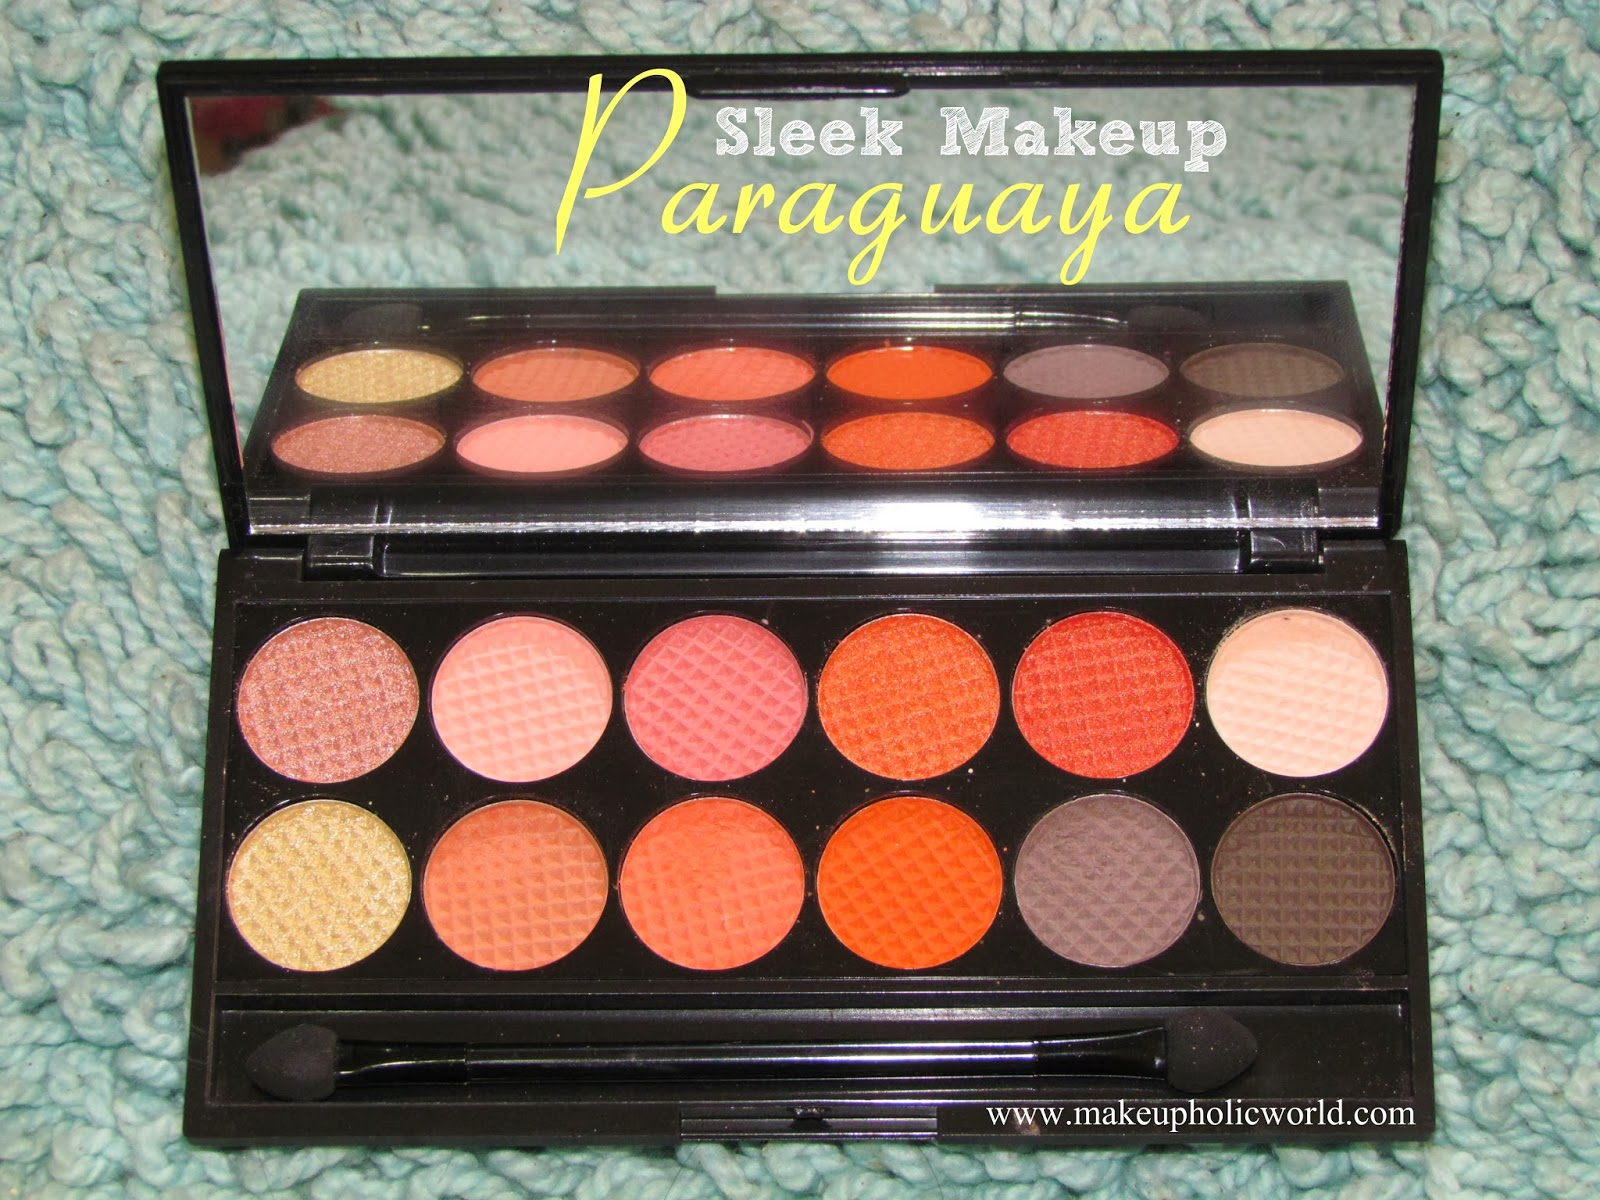 Sleek Makeup Limited Edition Eye Shadow Palette- Paraguaya